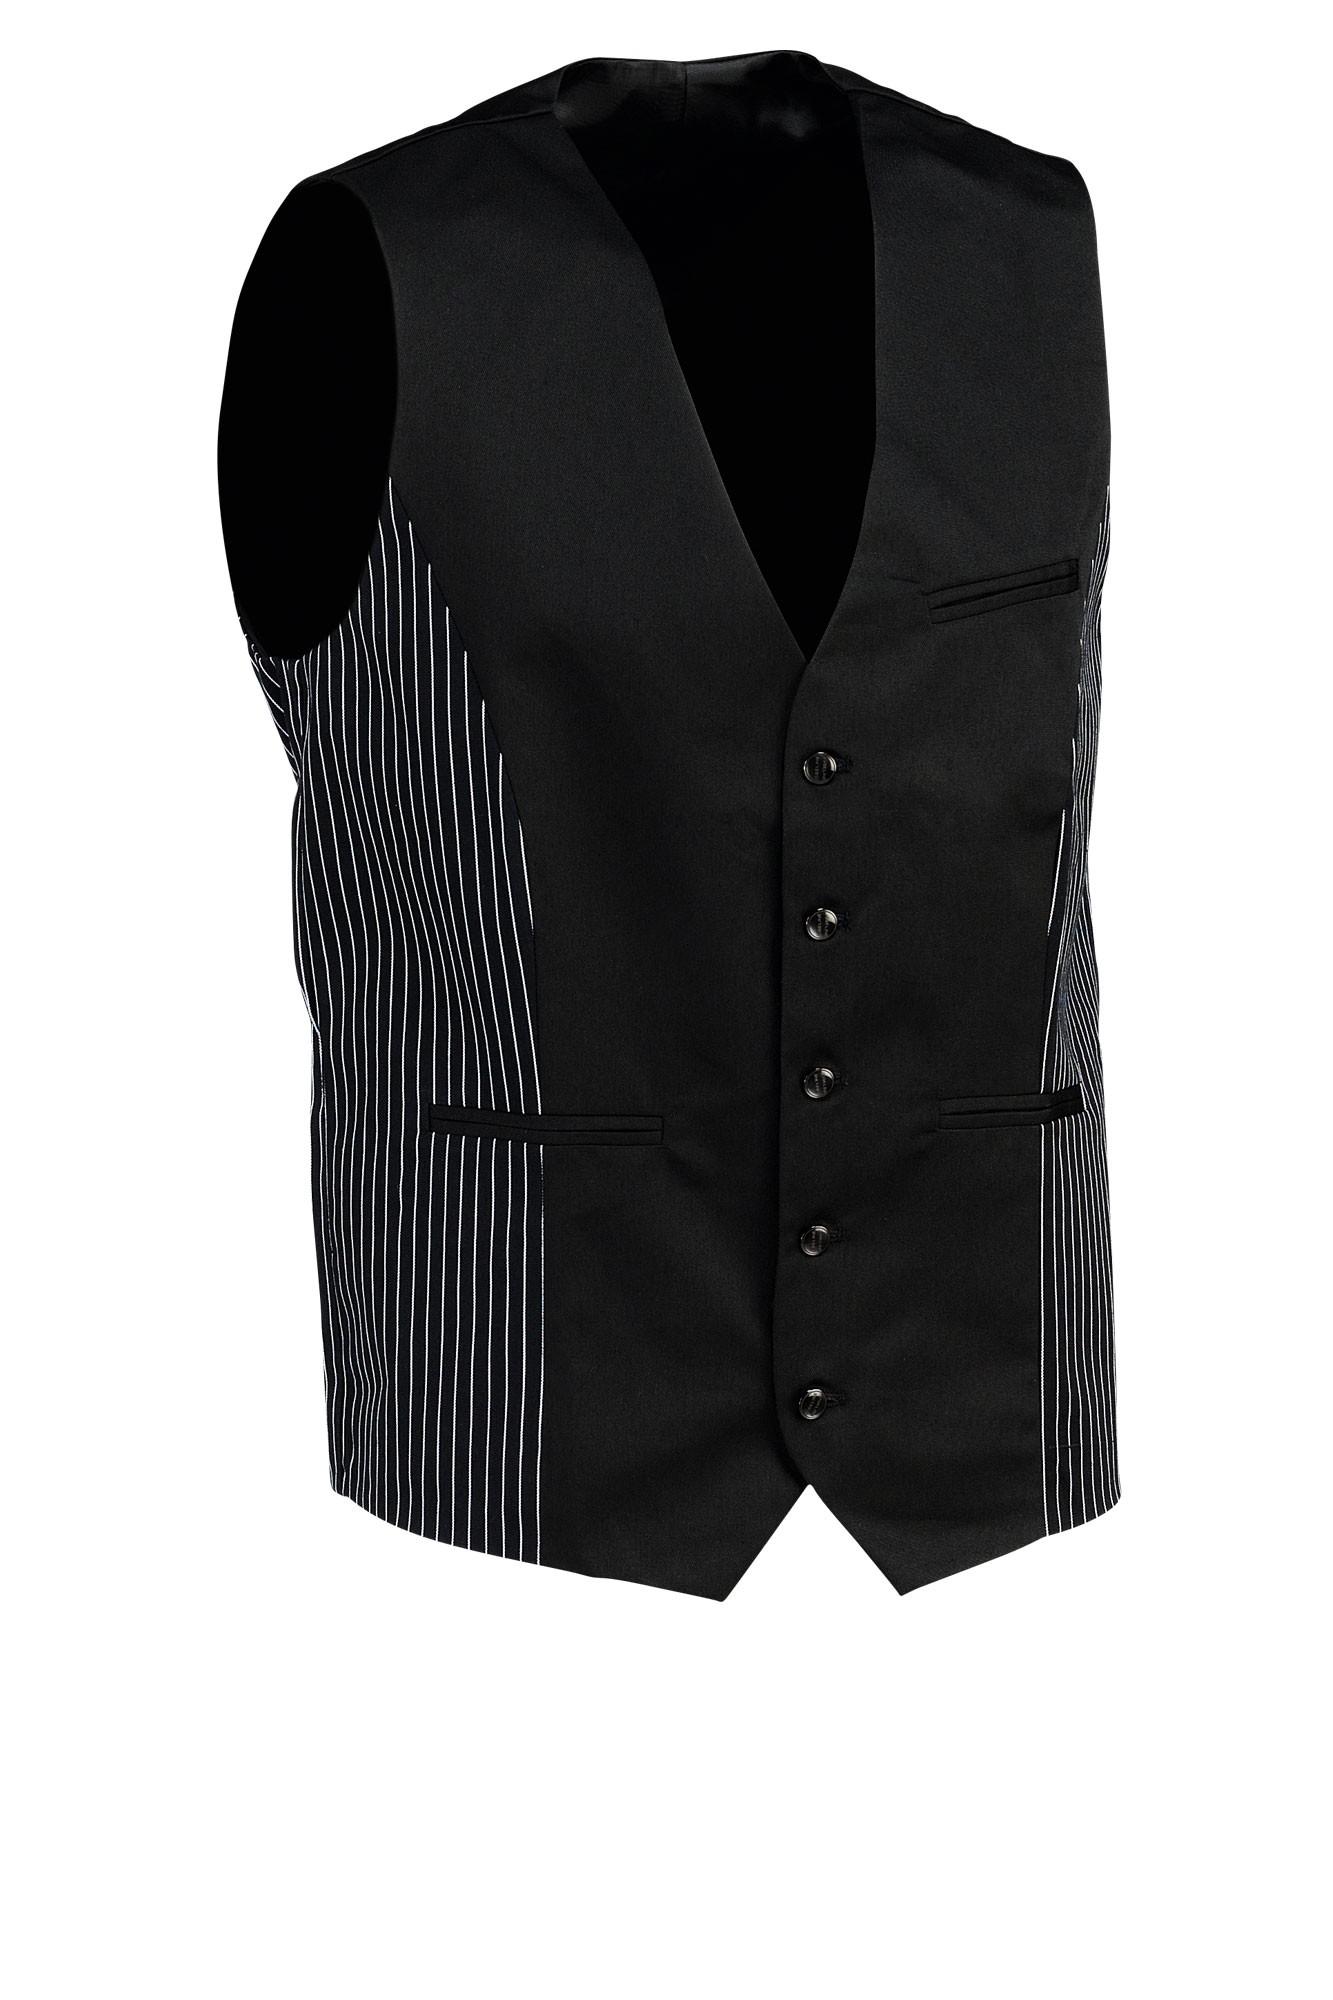 Pánská vesta Pilar - černá